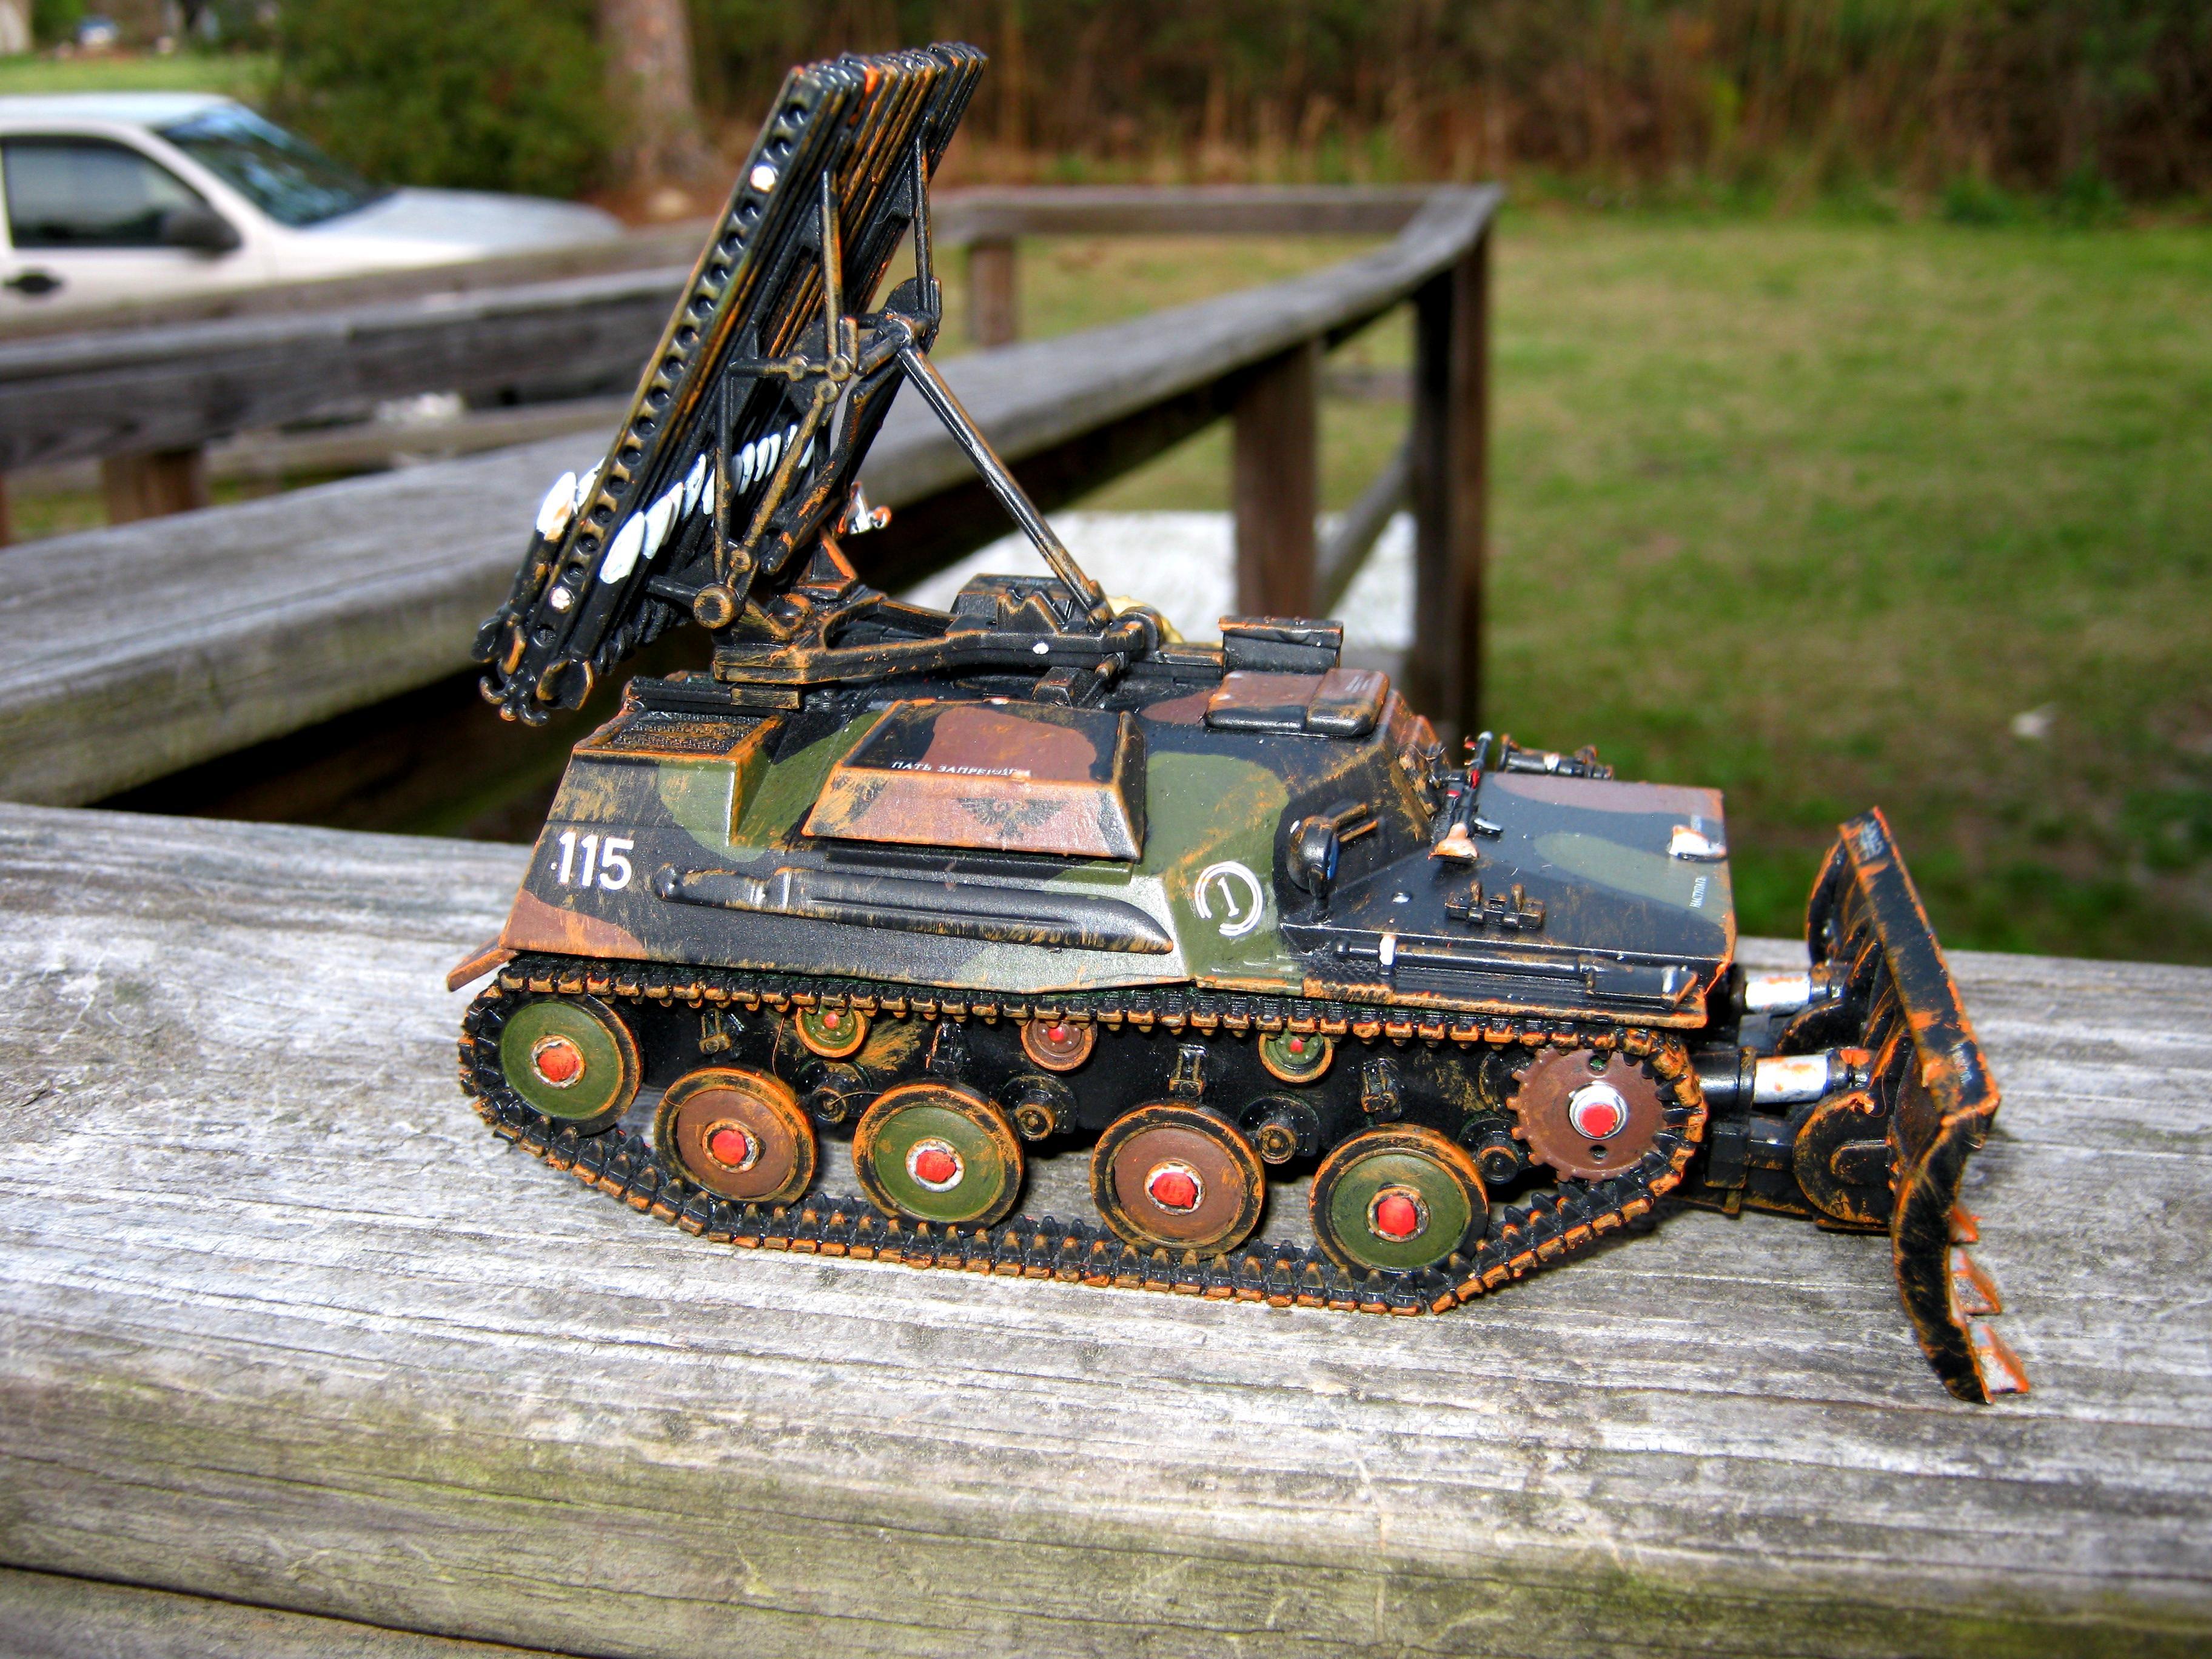 Afv, Amphibious, Artillery, Conversion, Imperial, Katyusha, Light Tank, Rocket Launcher, Self-propelled, Soviet, Tank, World War 2